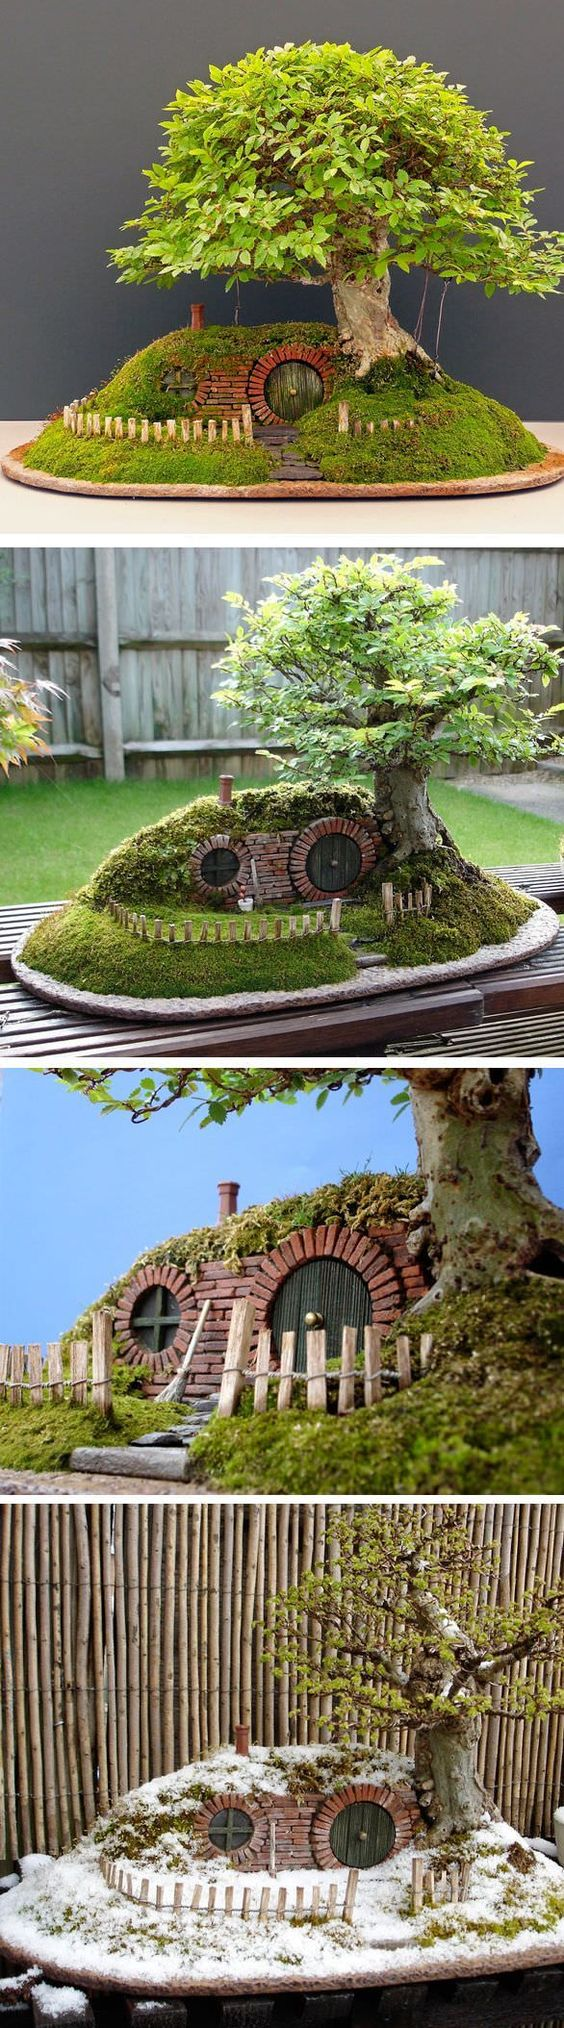 14 Fairy Garden Ideas For Kids At Heart | Giardini, Creativo e Per ...